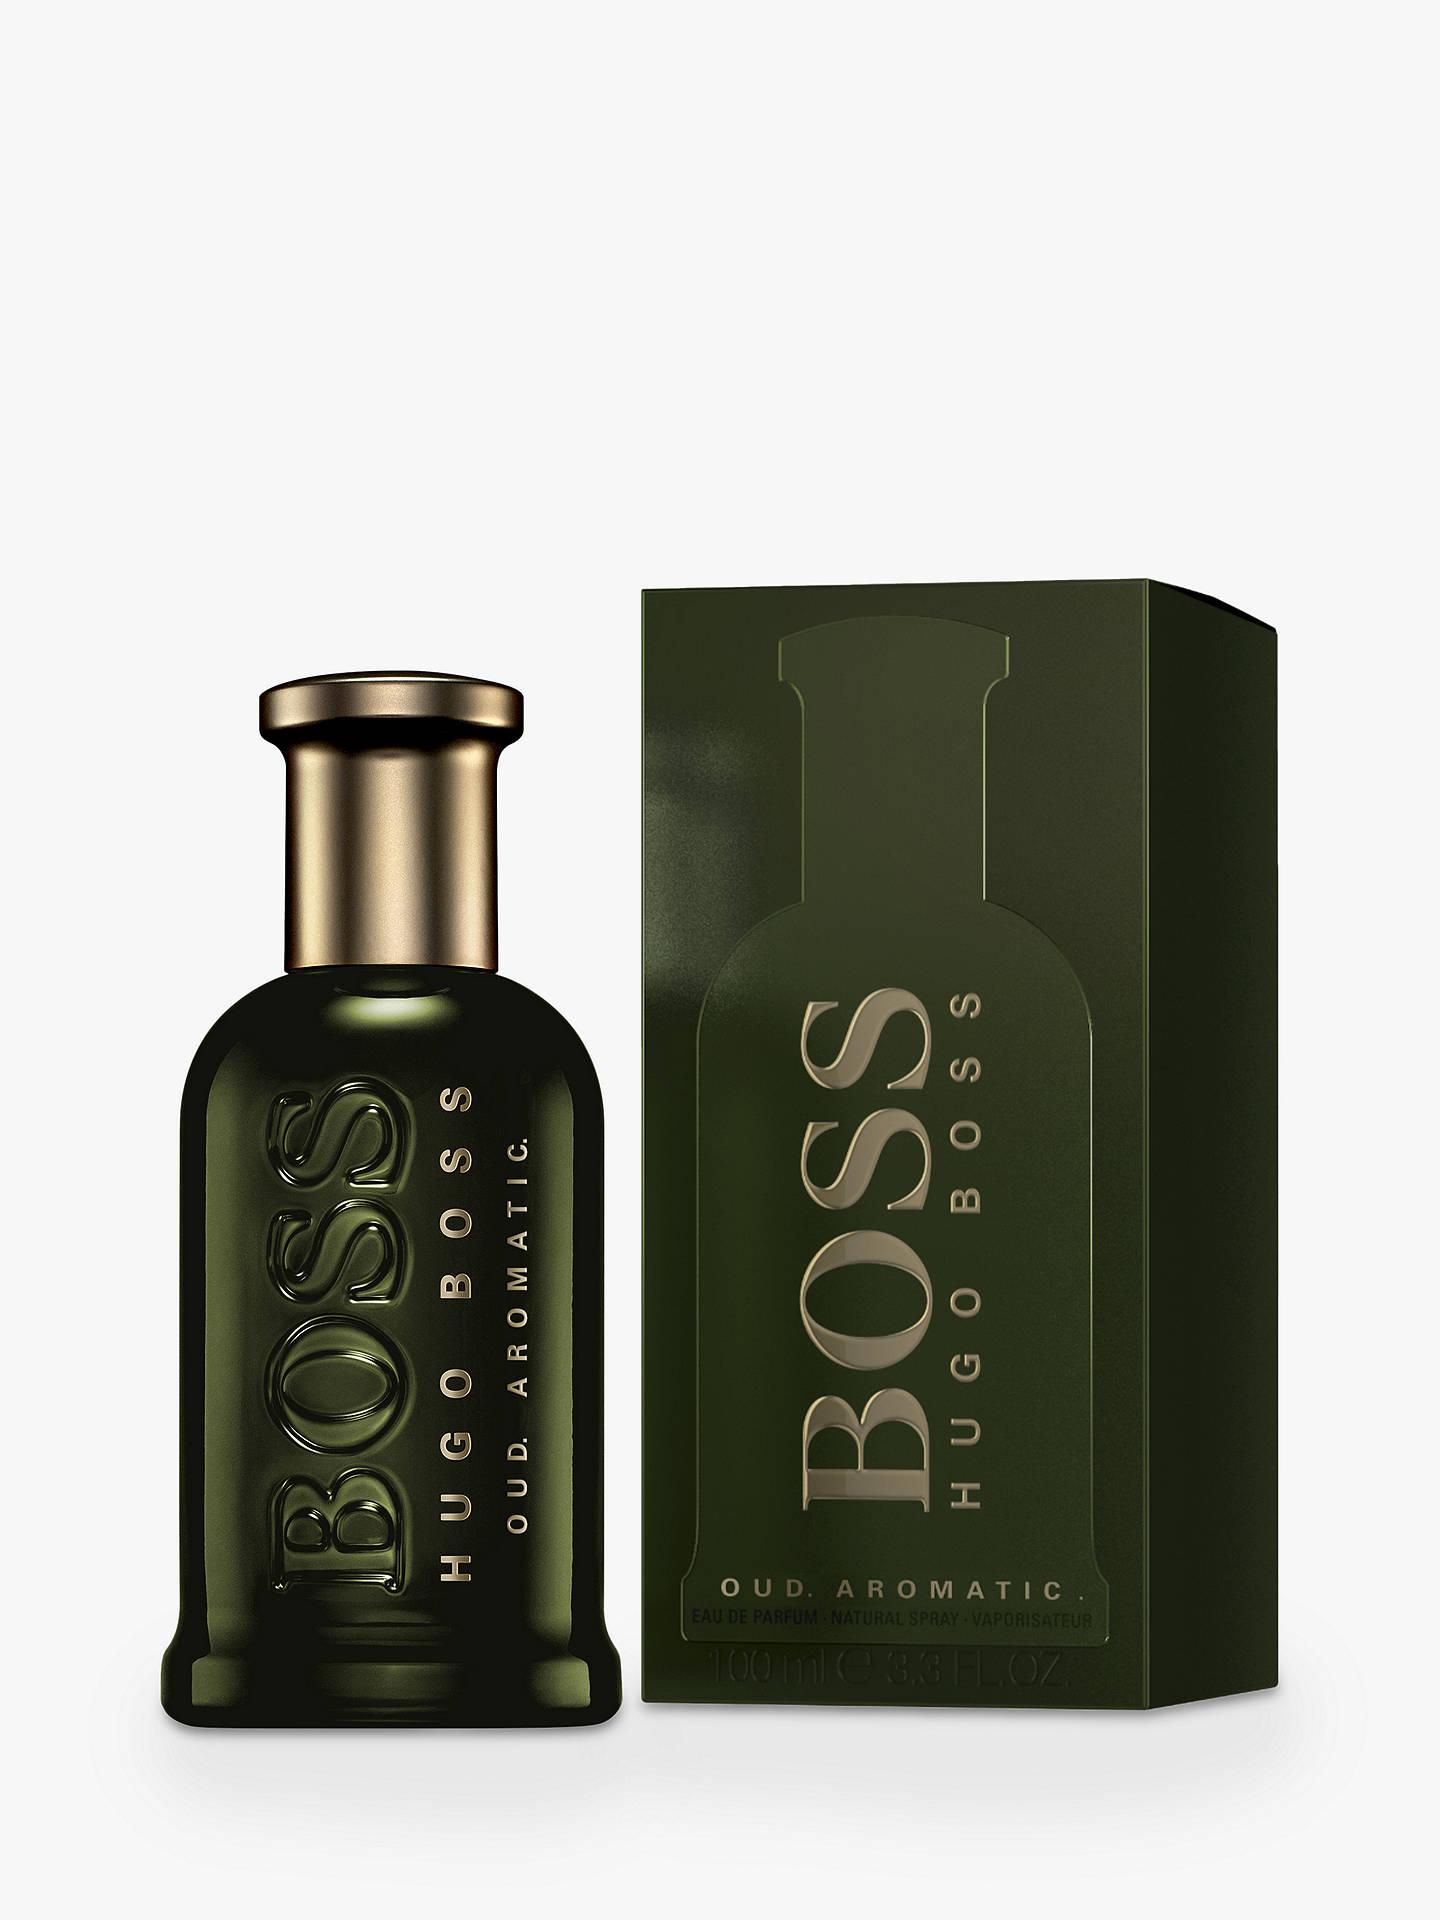 Hugo Boss Boss Oud Aromatic Eau De Parfum Limited Edition 100ml At